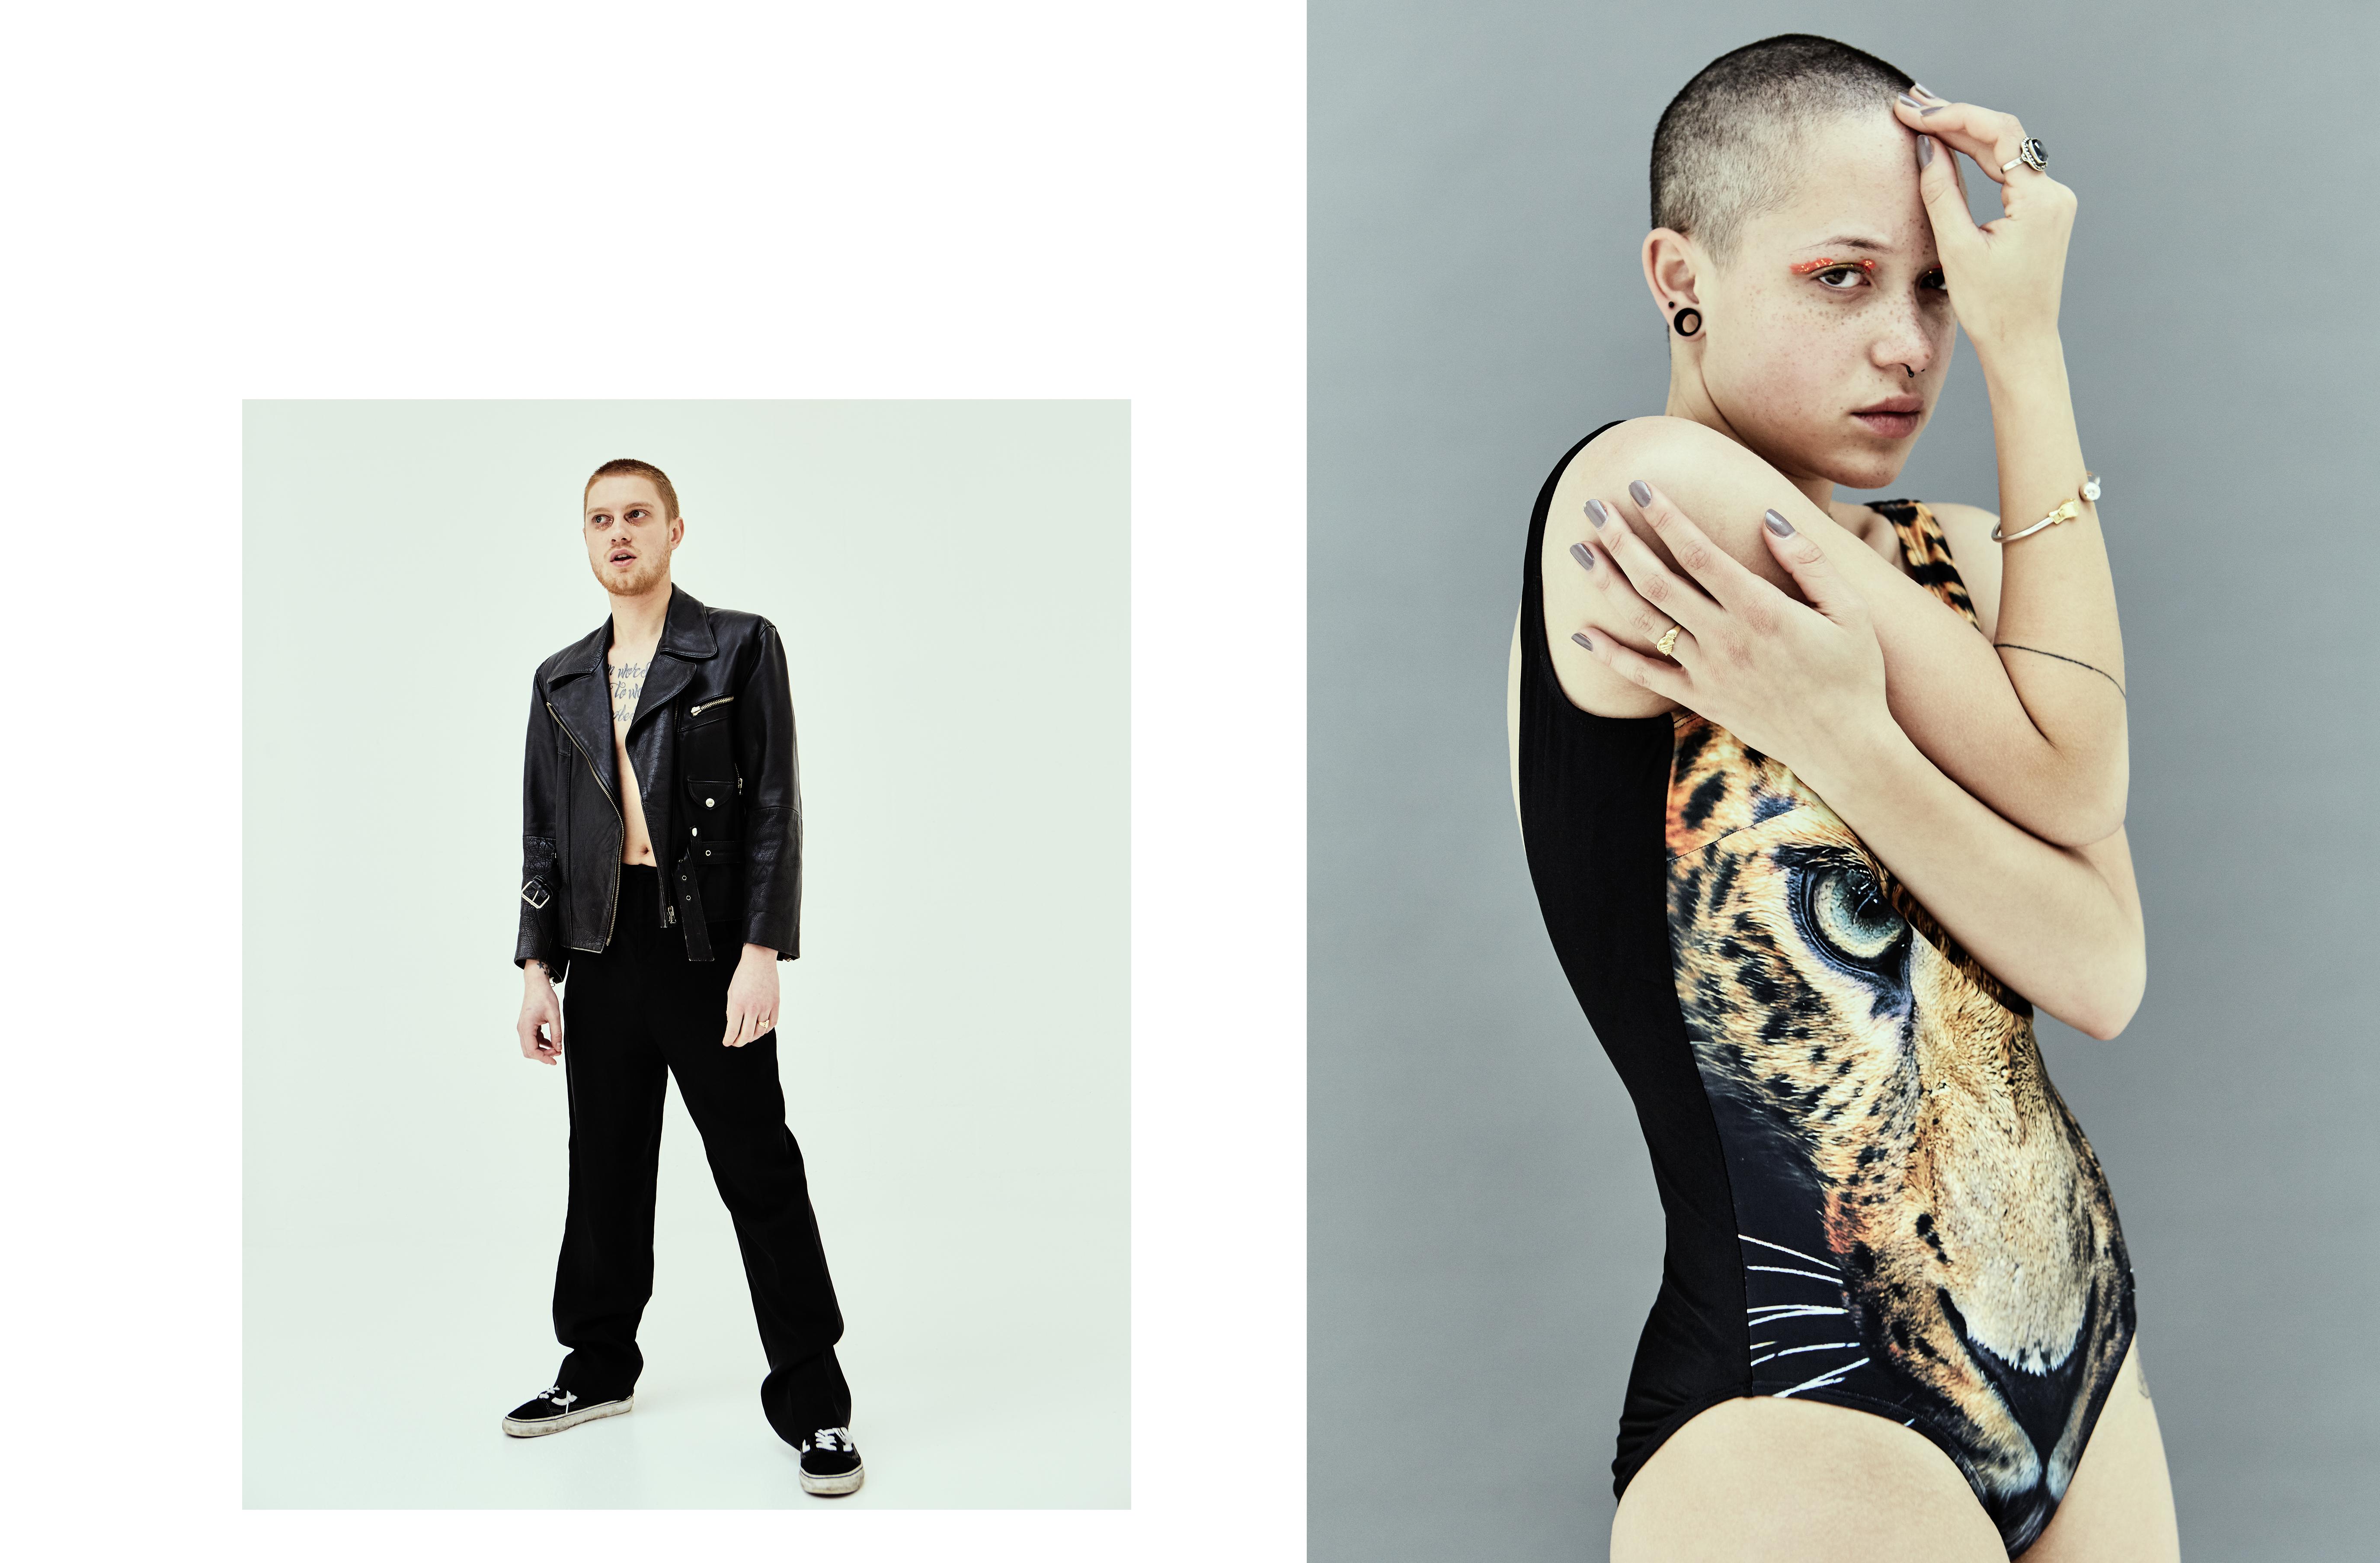 Andy Tan - 3 LINK magazine - Pim Thomassen Agency